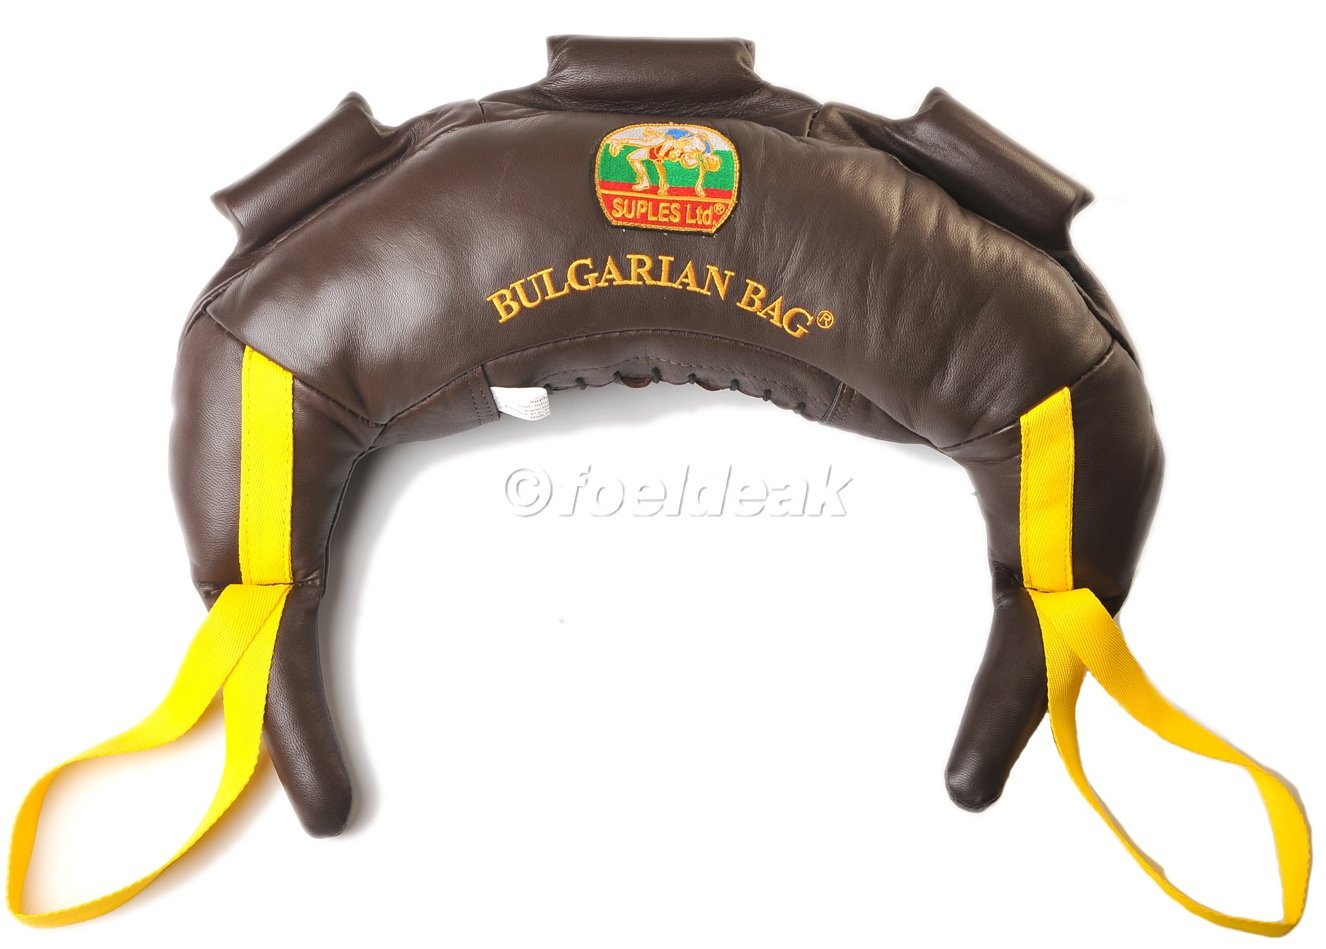 Bulgarian Bag aus Leder in 5 kg